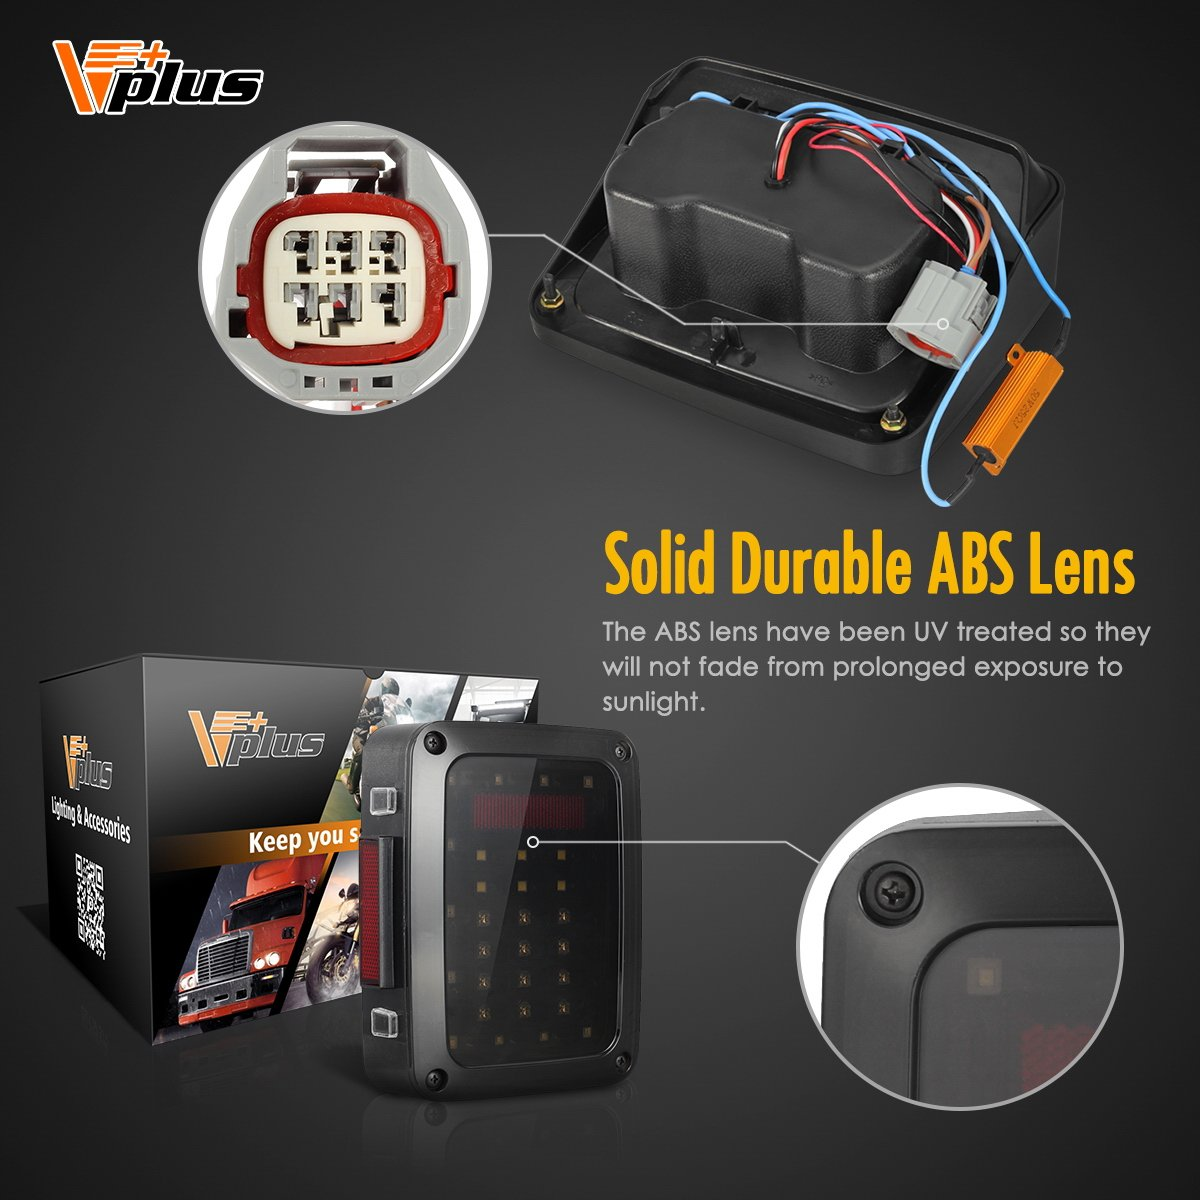 Vplus Led Tail Lights Assembly Smoke Lens Brake Turn Cj Jeep Trailer Wiring Harness 2014 Stop Reverse Drl Light Lamp Replacement For 2007 2017 Wrangler Yj Jk Tj Jku Sports